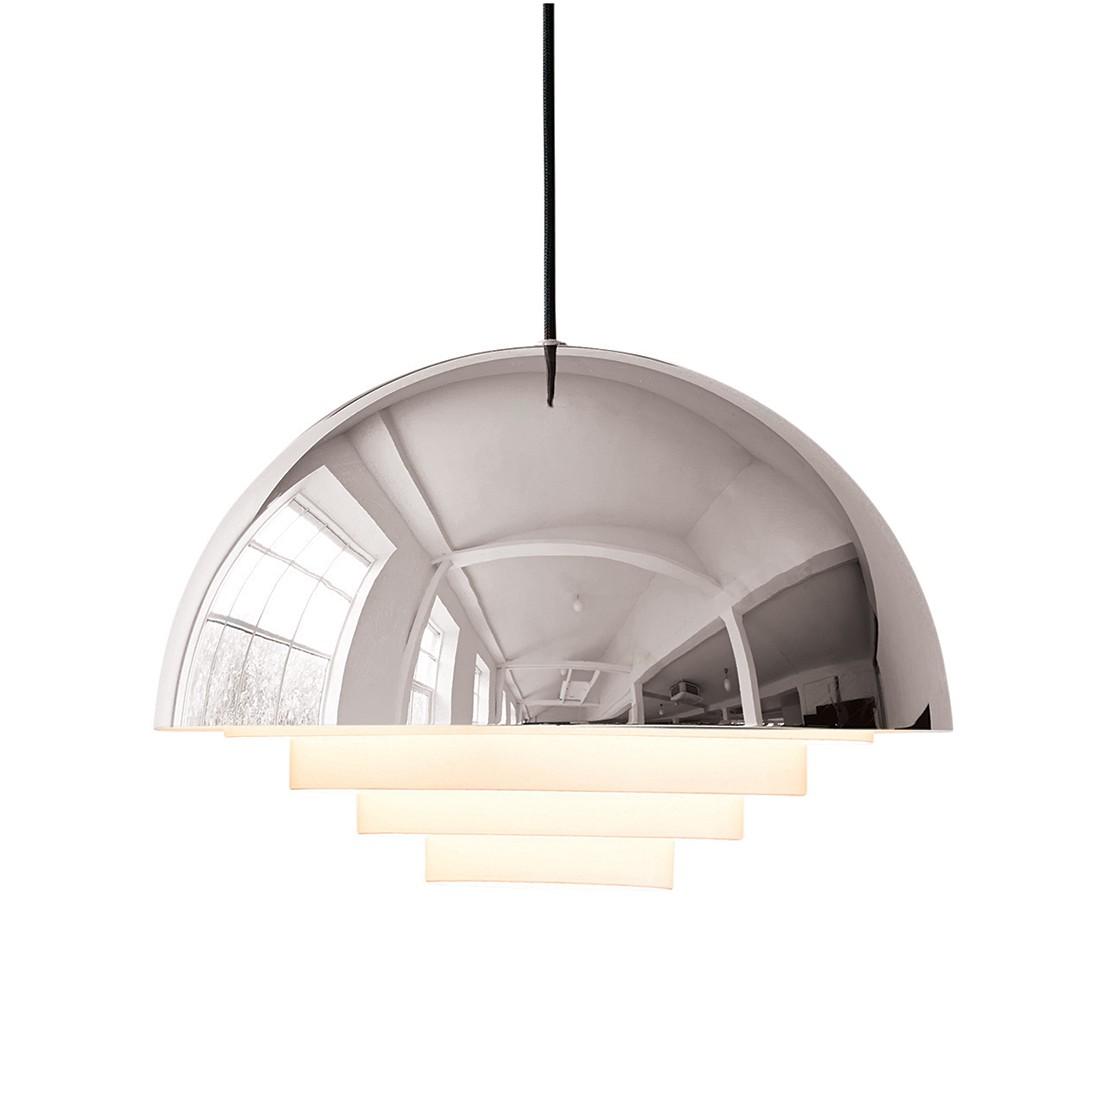 pendelleuchte motown metall silber 1 flammig herstal a online kaufen. Black Bedroom Furniture Sets. Home Design Ideas